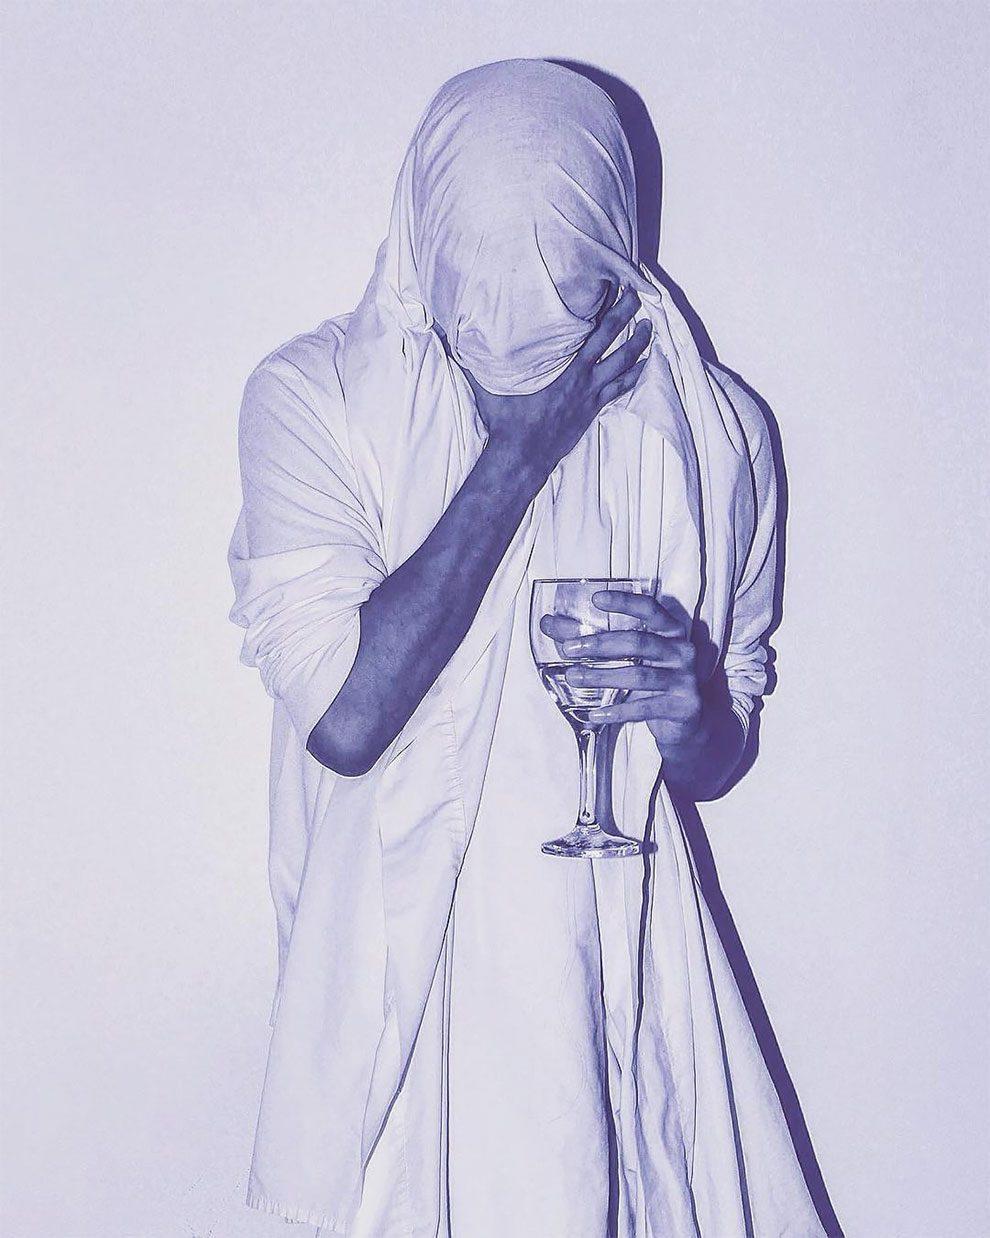 disegni-penna-biro-iperrealismo-alfredo-chamal-14